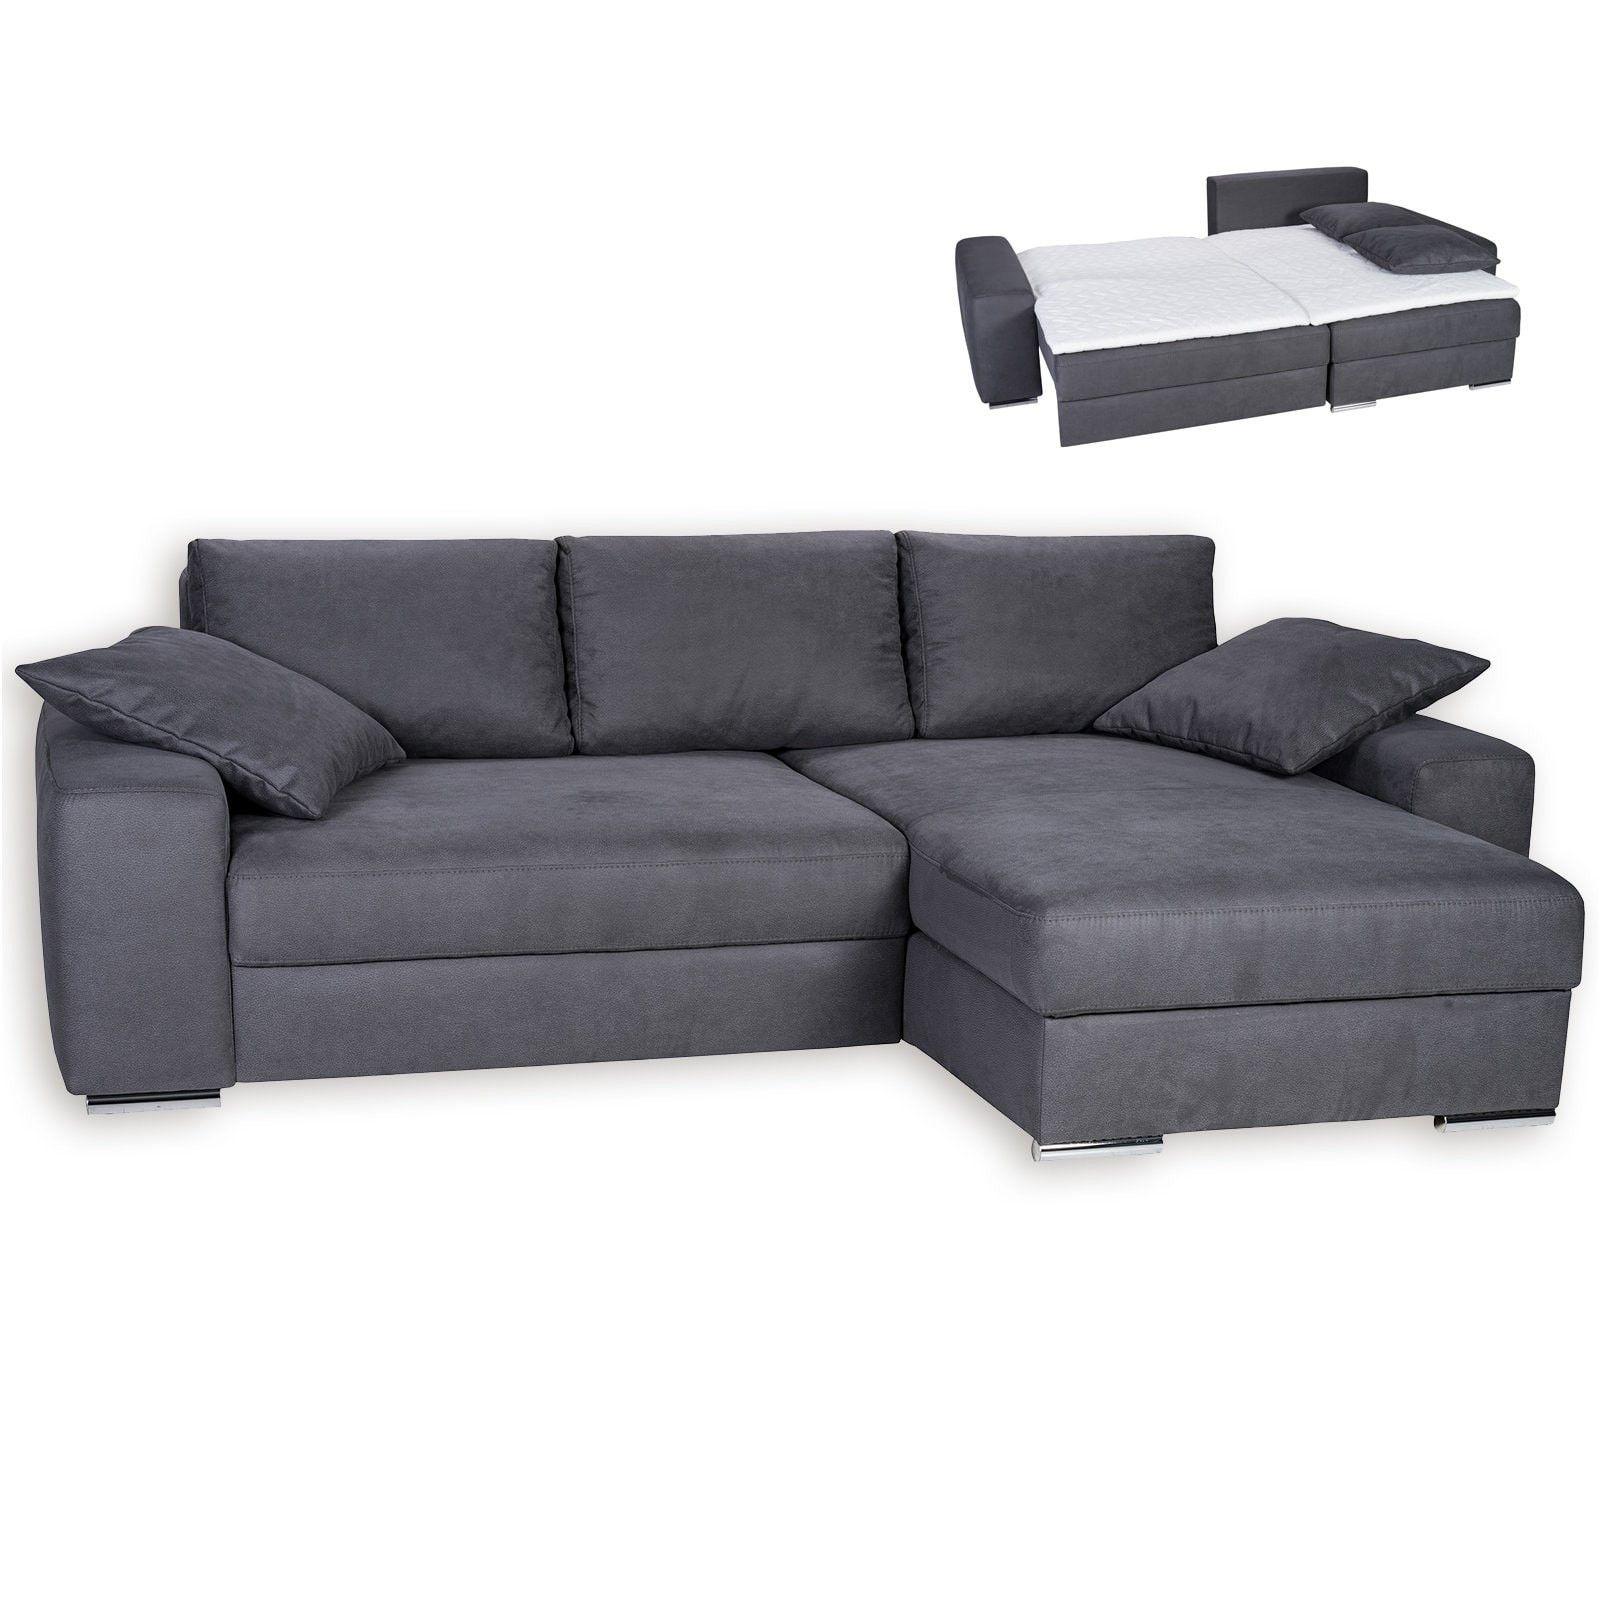 Interesting Poco Couch Bester Sammlung Mehr Als Poco Couch Tiger U With Couch Sconto